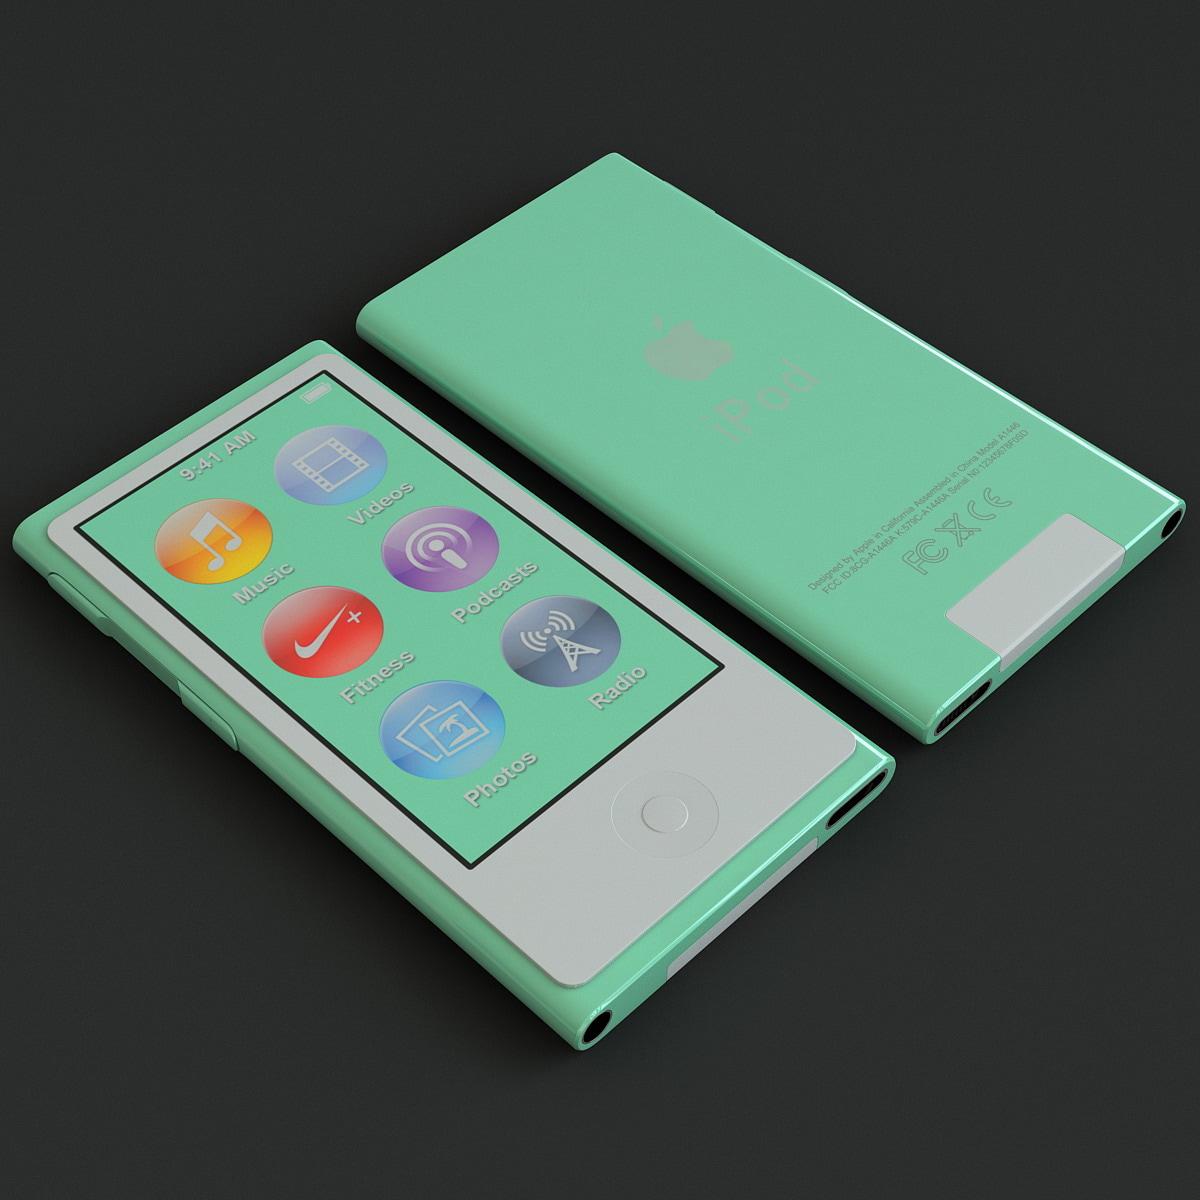 Ipod_Nano_Generation_7th_Green_004.jpg